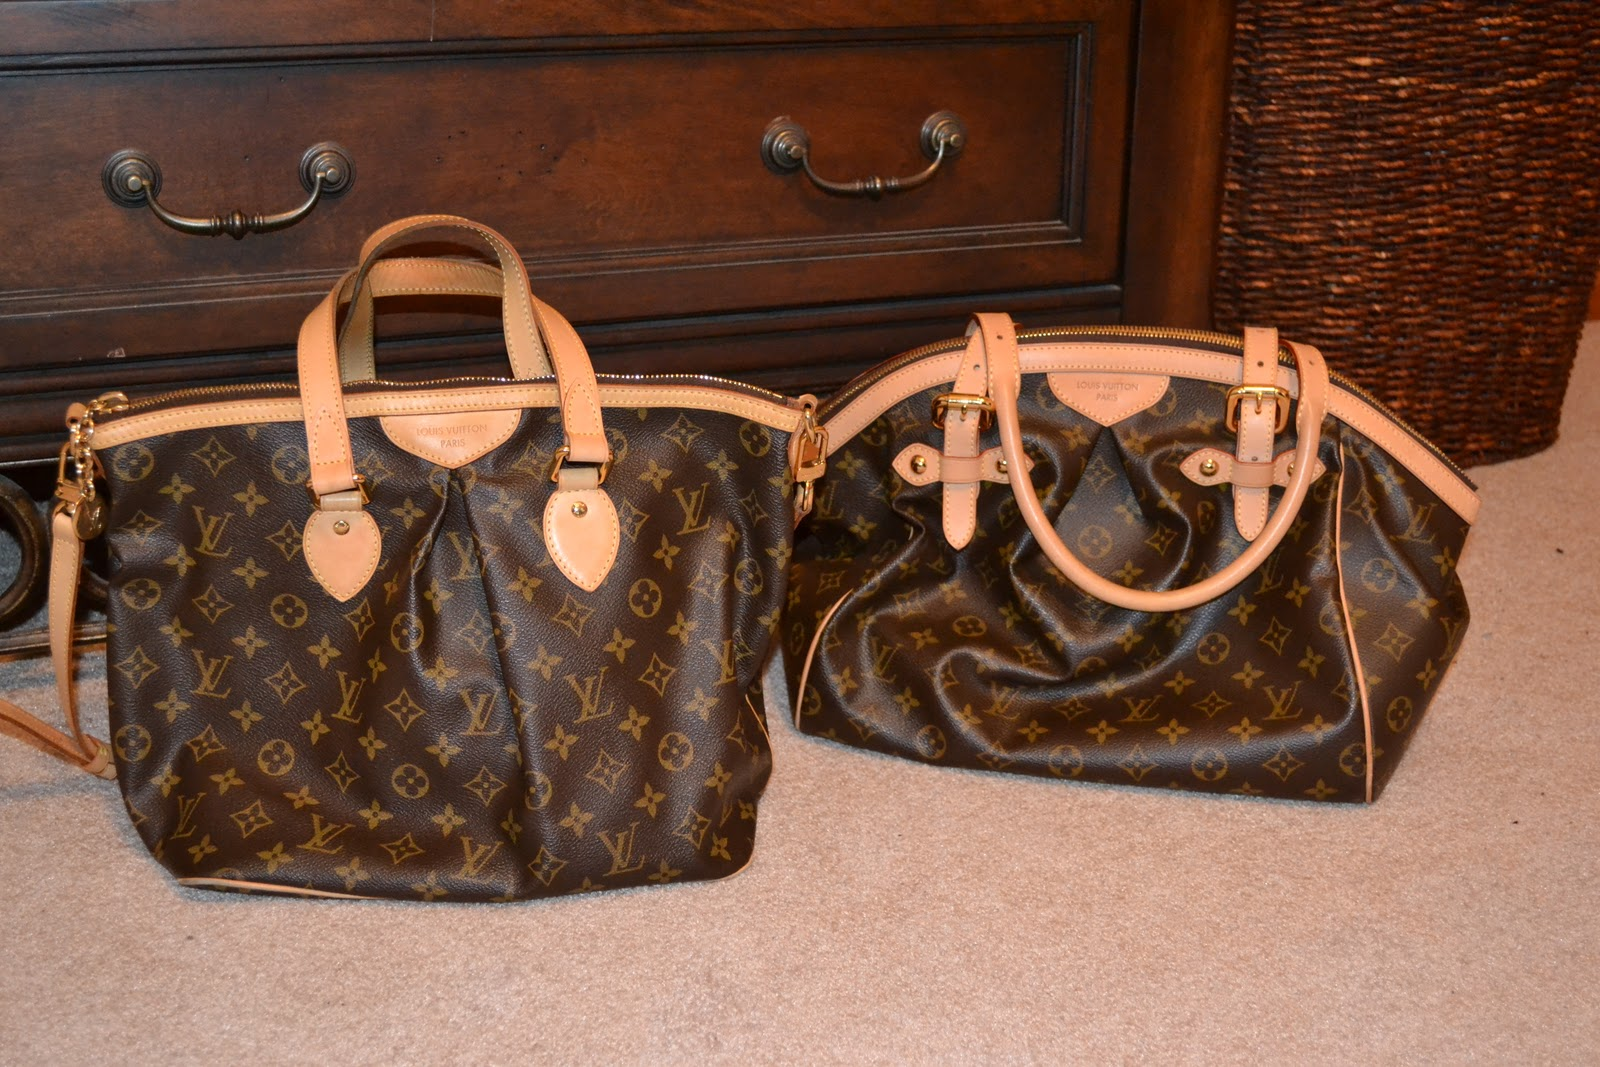 2d5b07909f0 Mom s Got a Brand New Bag  Louis Vuitton Comparison Review  Palermo PM vs.  Tivoli GM